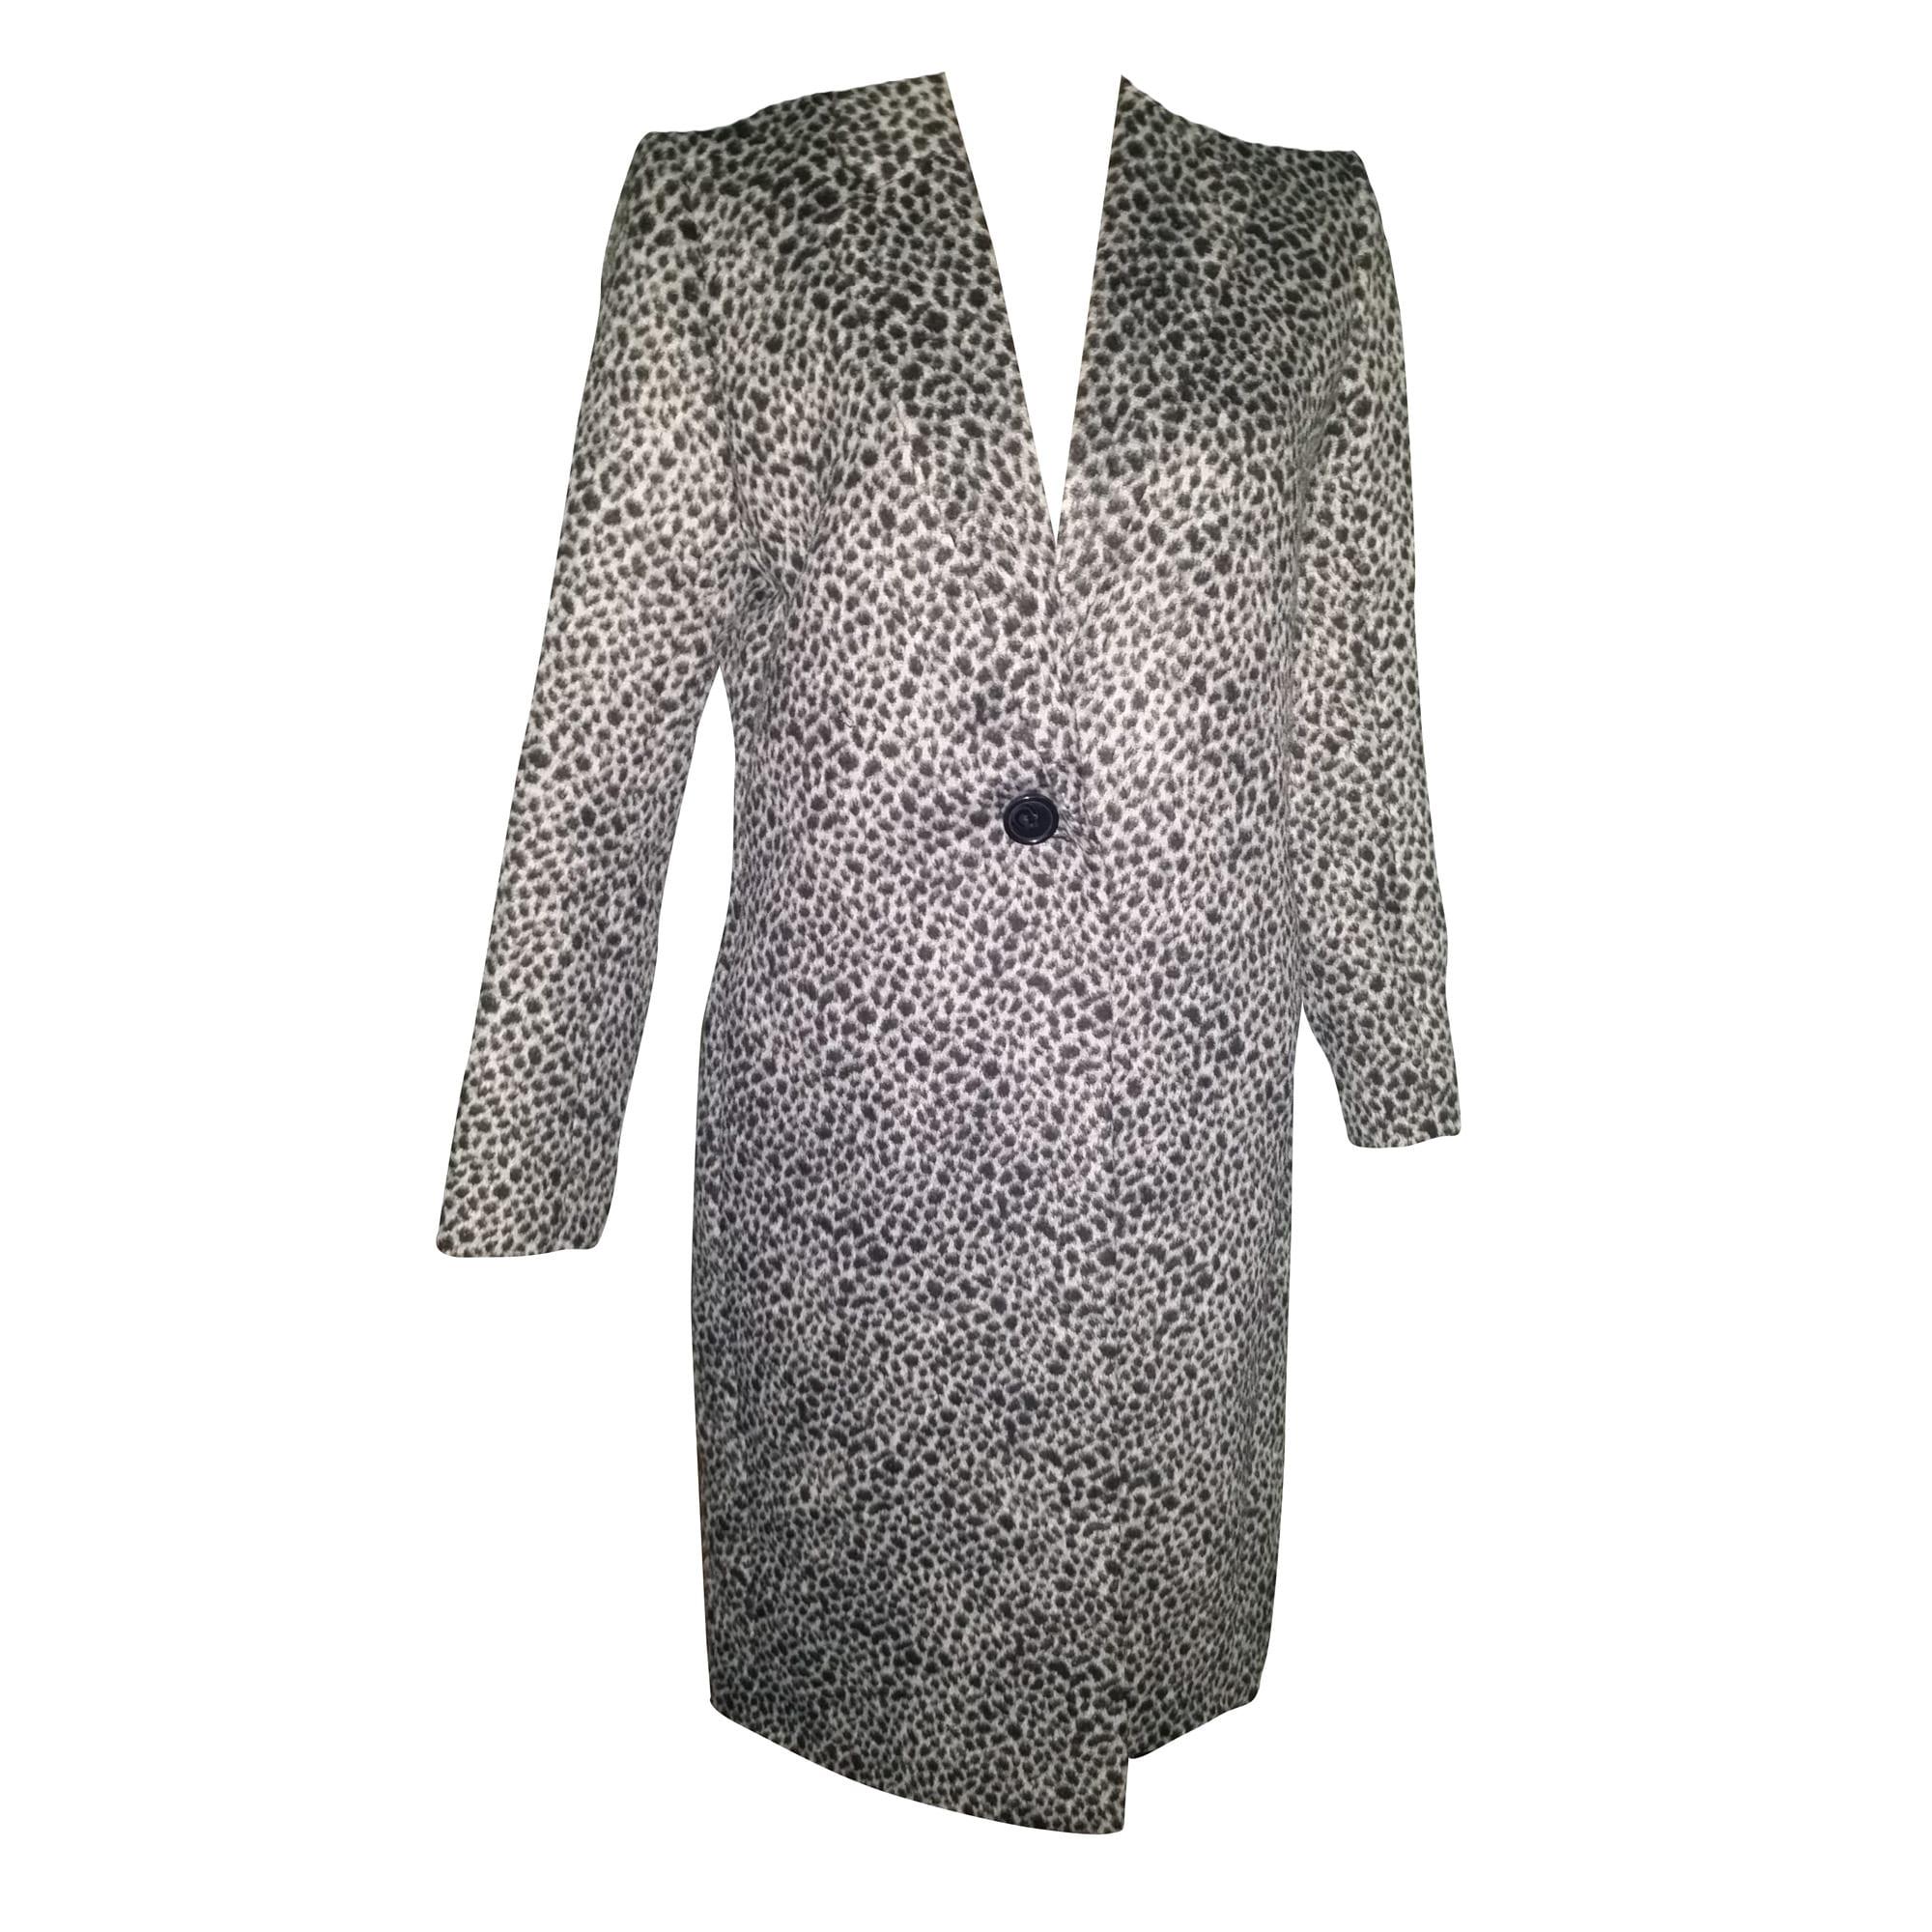 30957c565465 Manteau MAJE imprime leopard gris